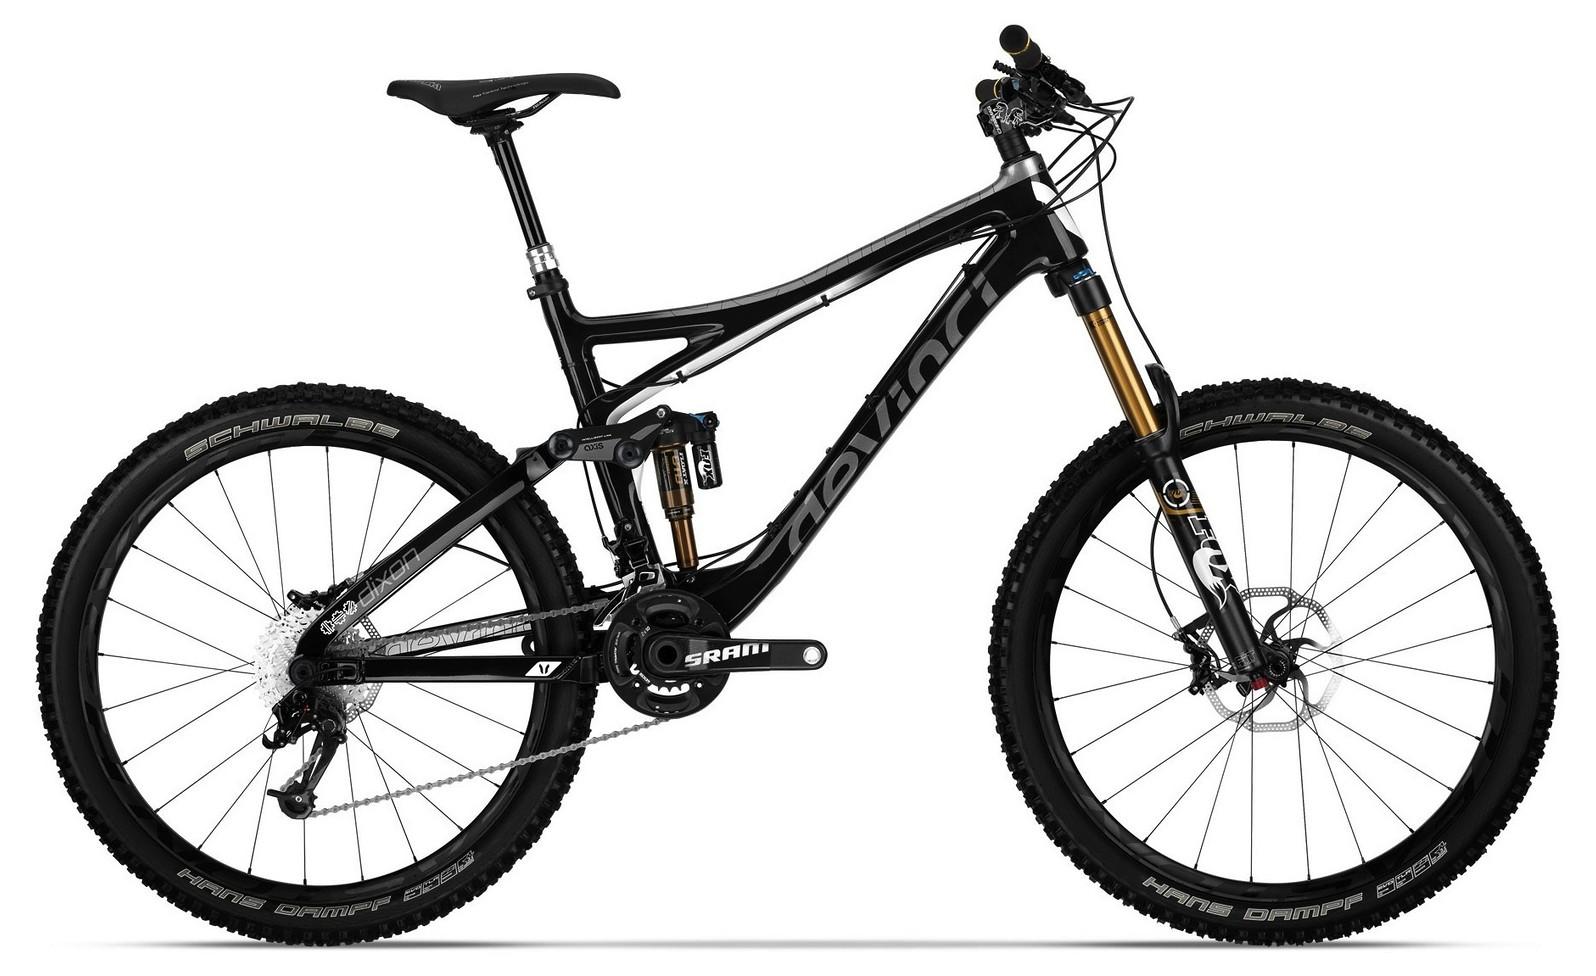 Bike - 2014 Devinci Dixon Carbon RR 2x10